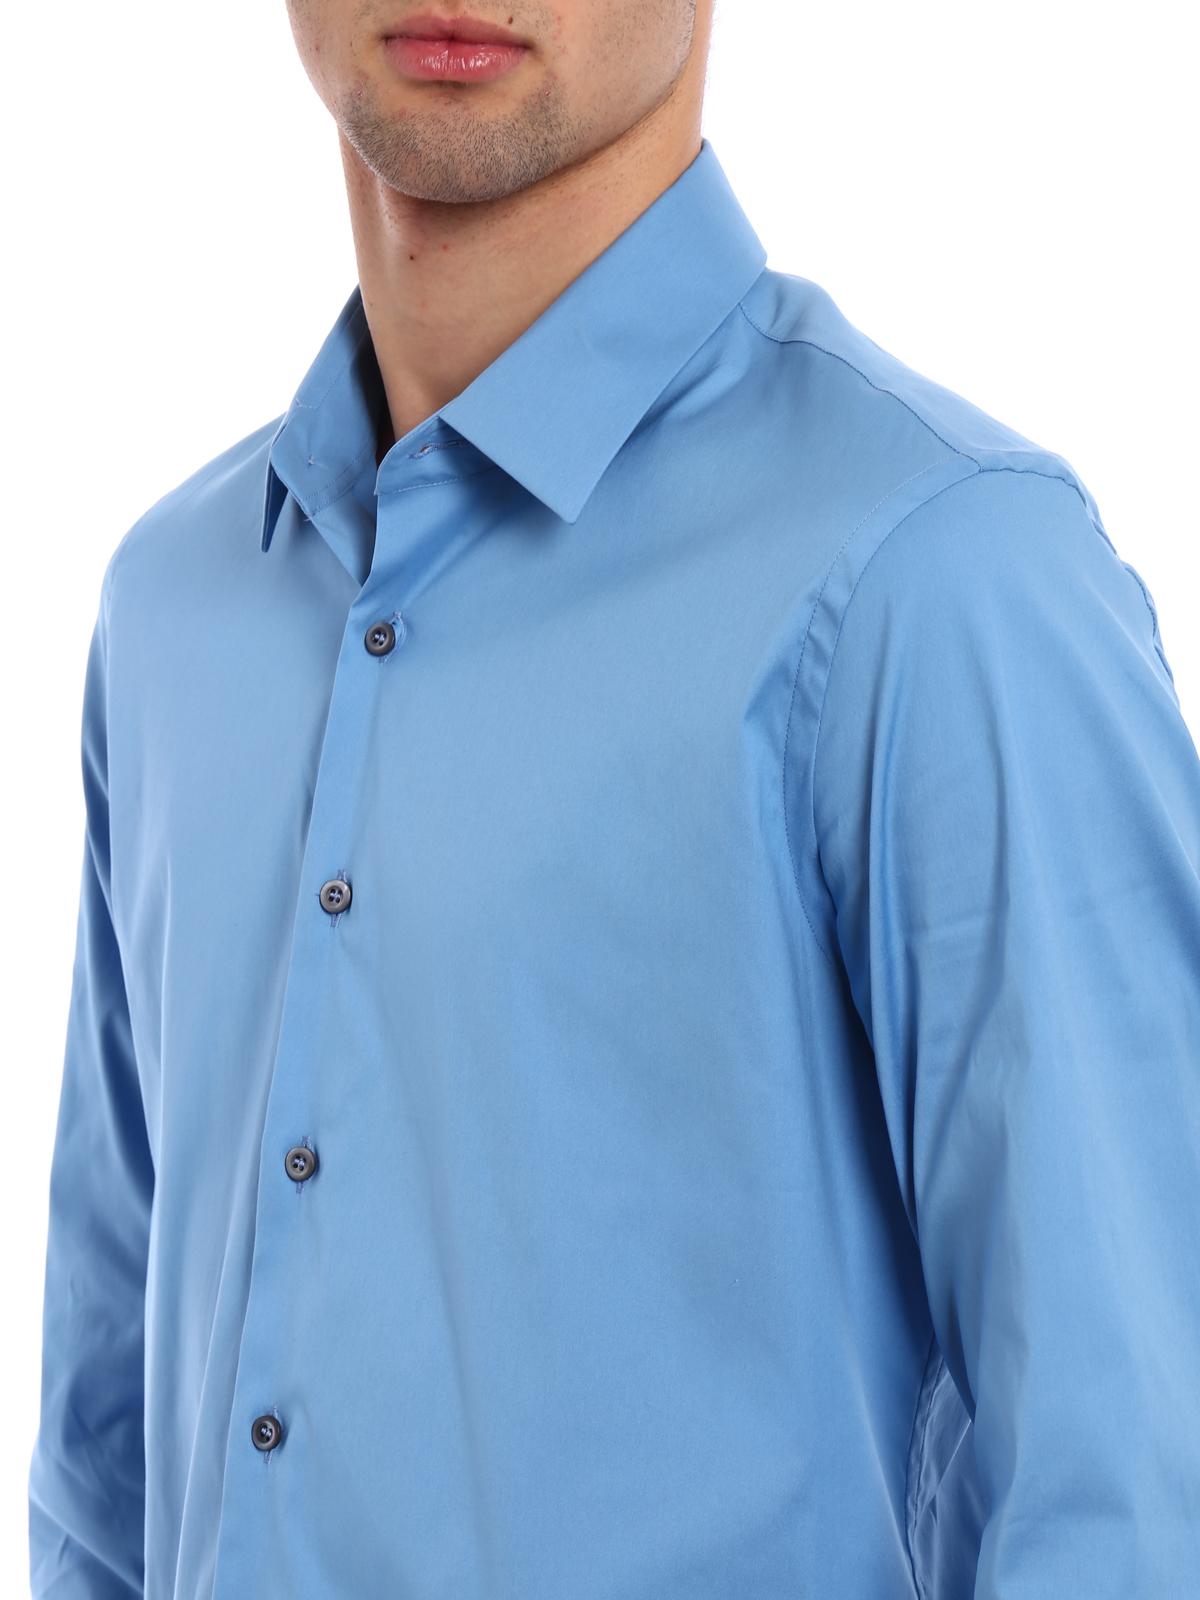 8484c6d577 Prada - Stretch poplin light blue shirt - shirts - UCM608 F62 F0076